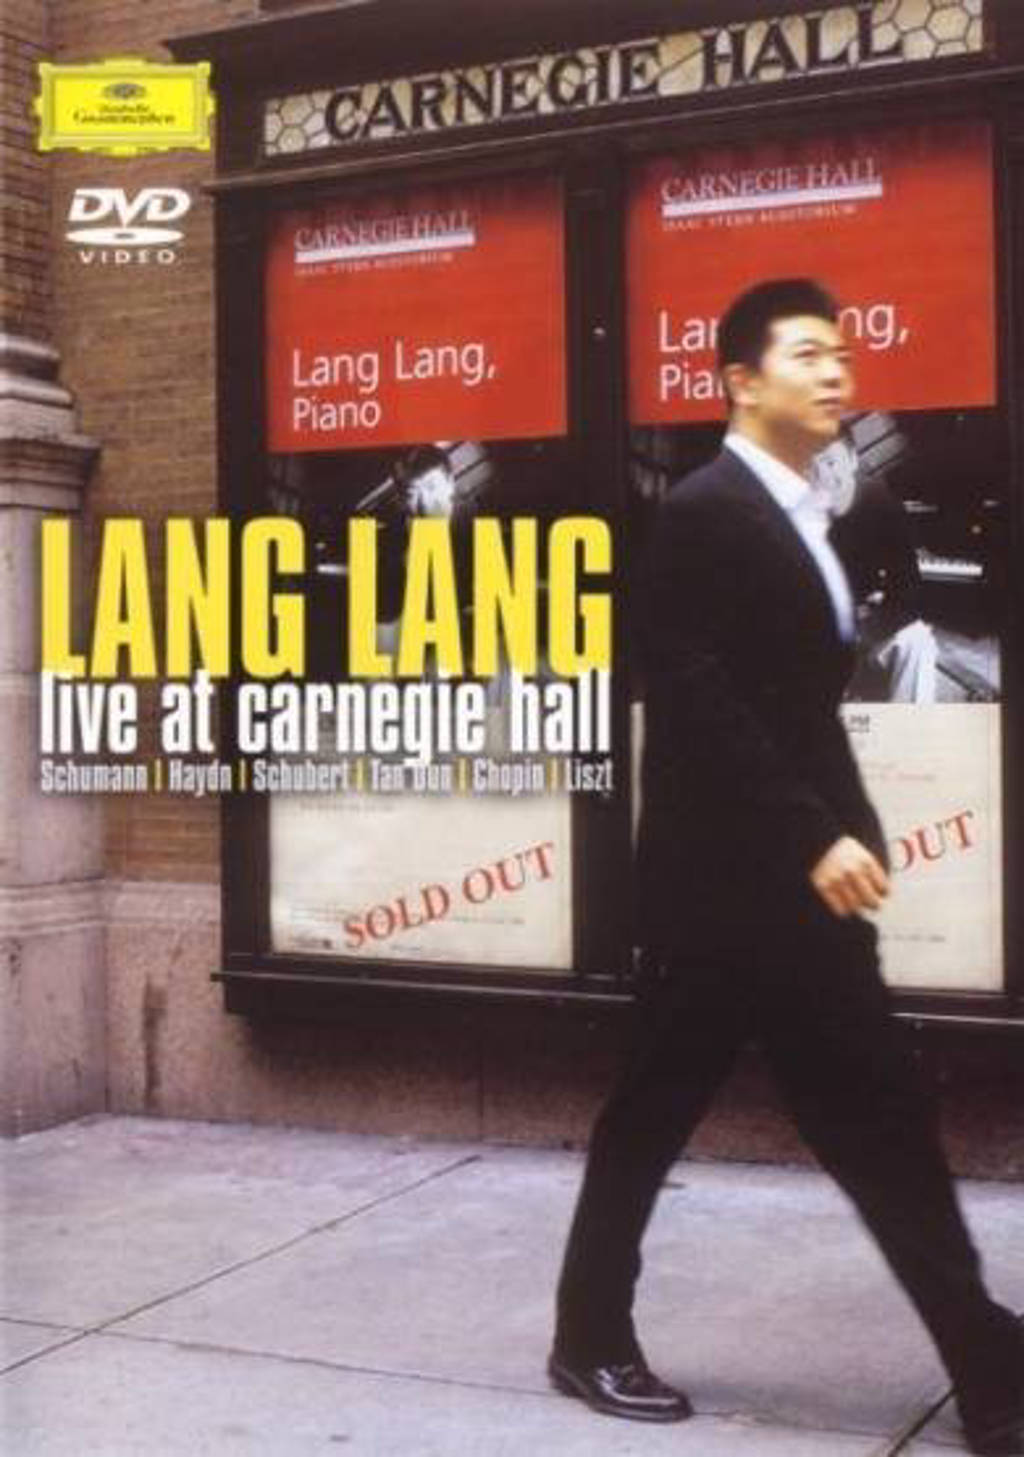 Lang Lang - Live at Carnegie Hall (DVD)